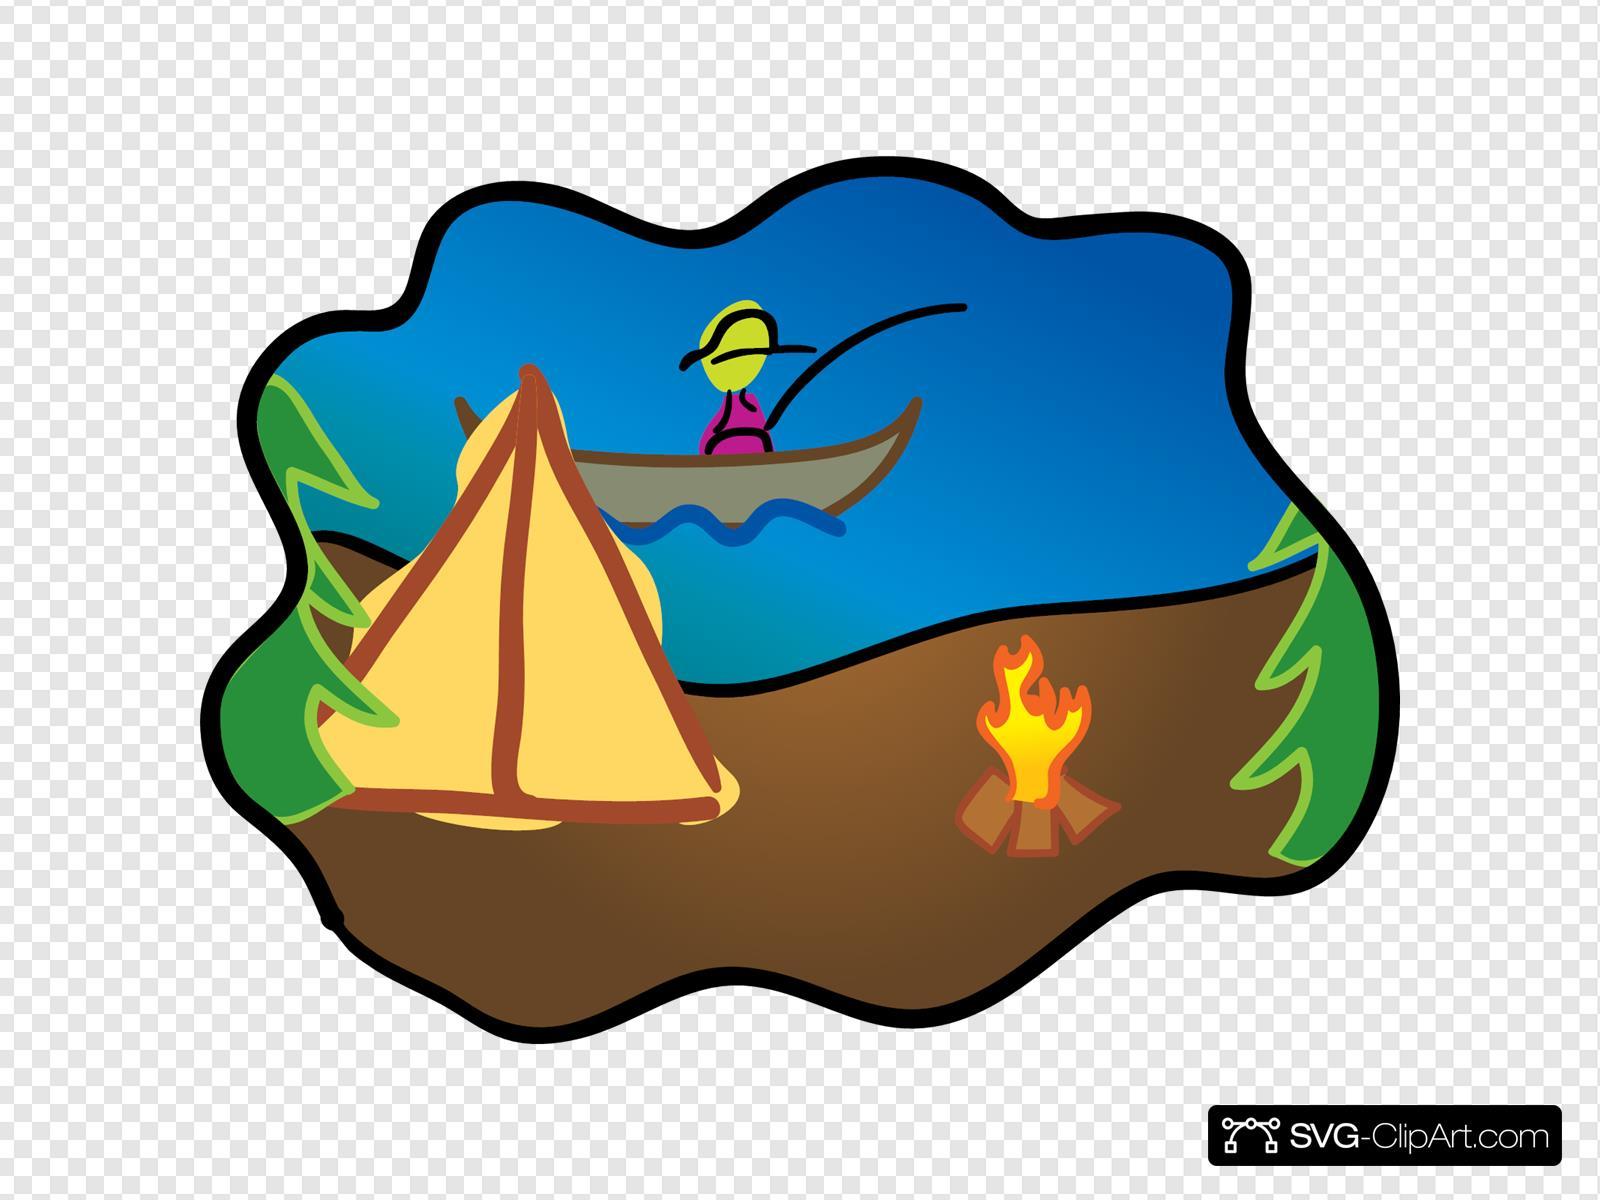 Camping Scene Svg Vector Camping Scene Clip Art Svg Clipart